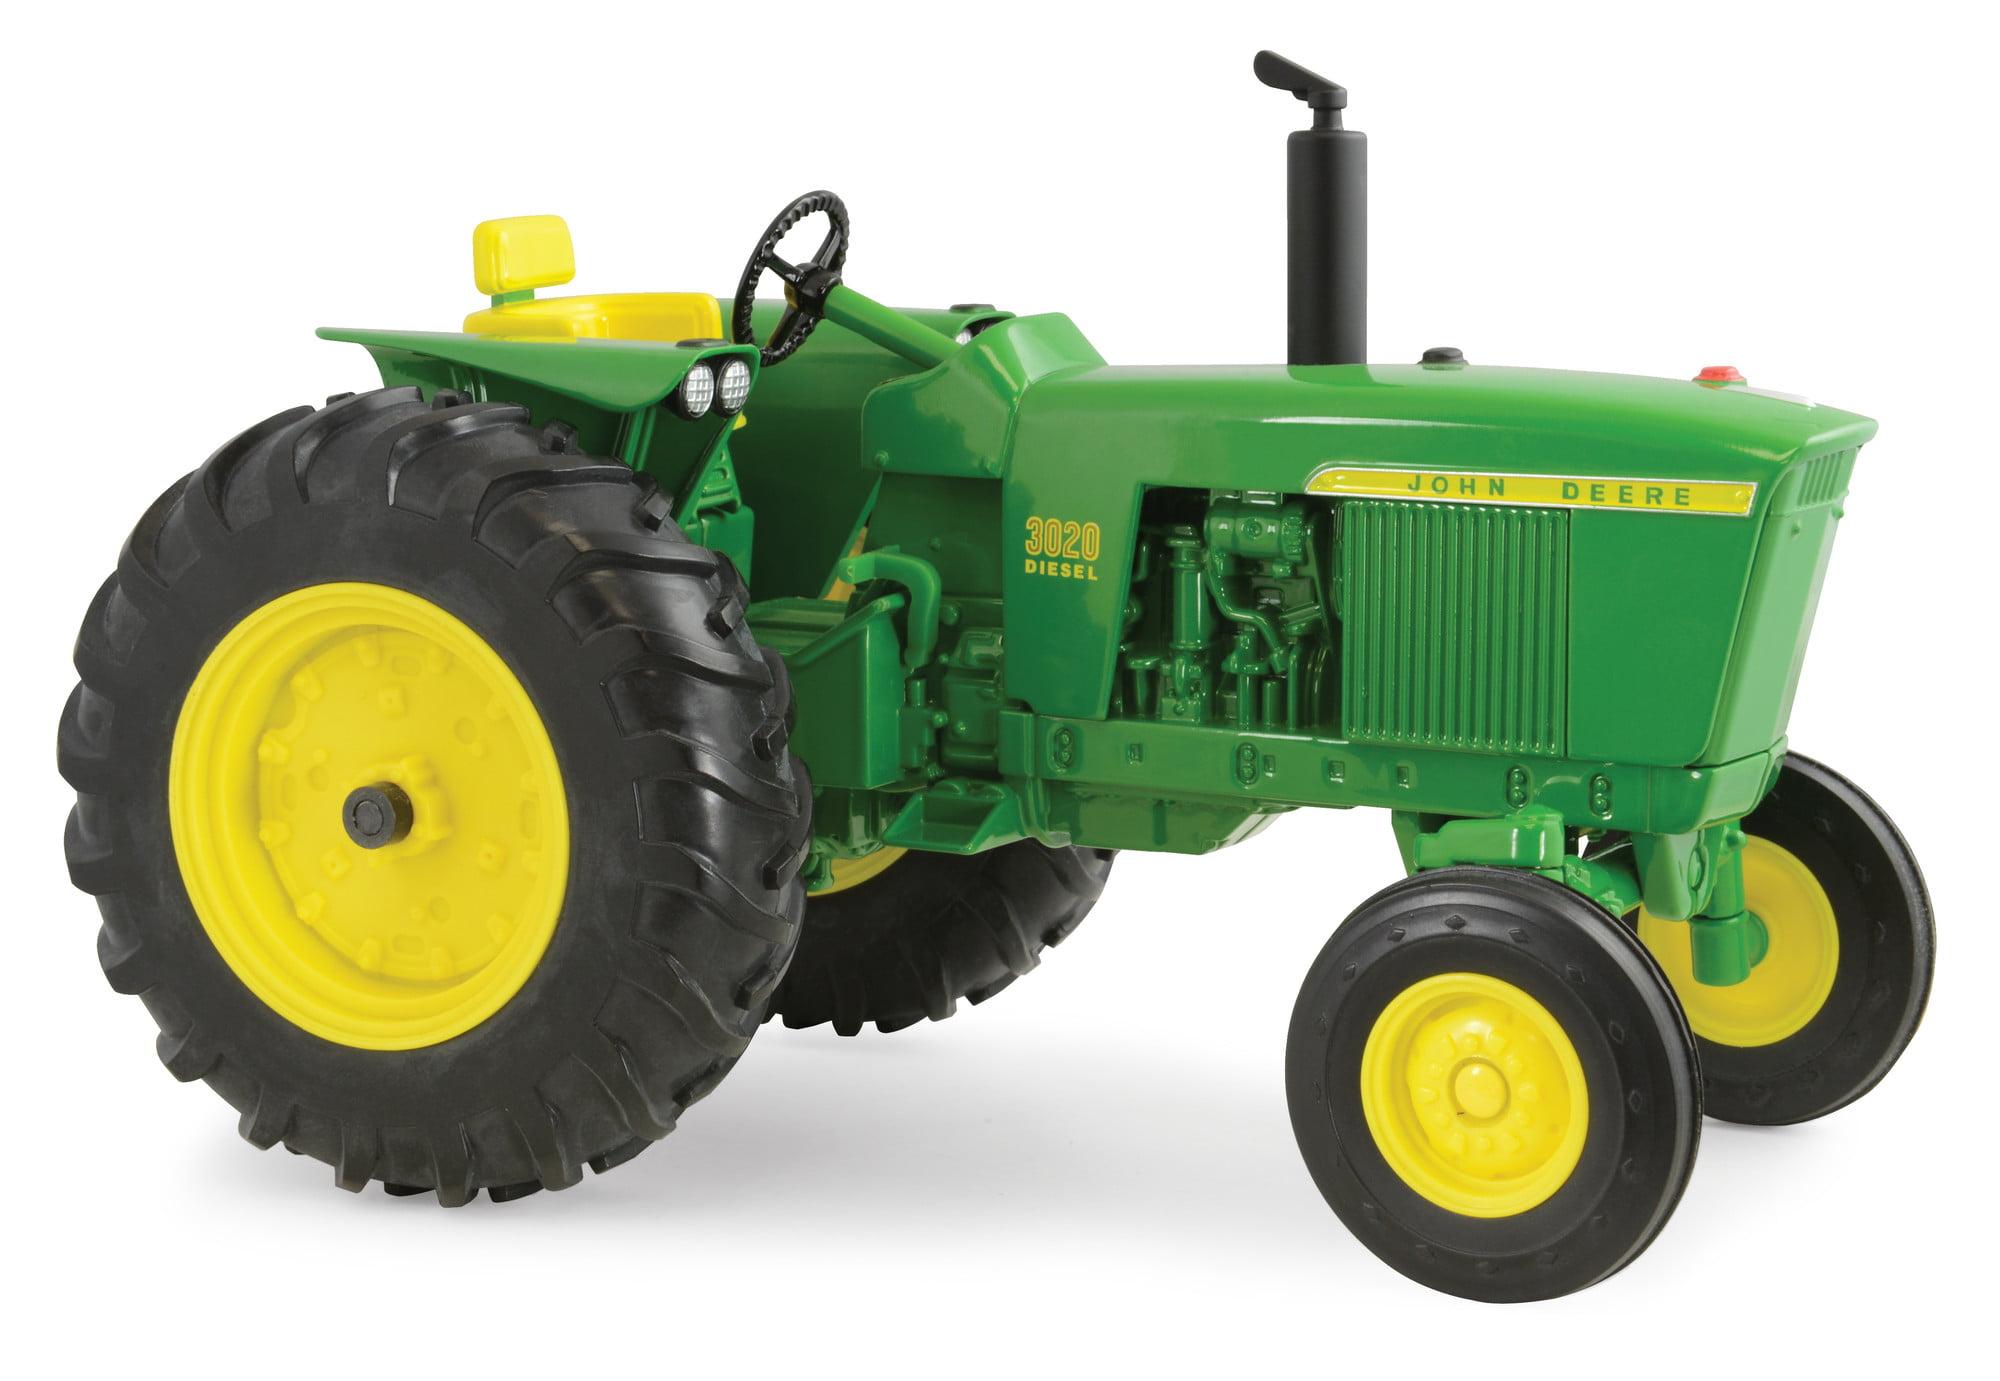 1:16 John Deere 3020 Tractor by Tomy Inc